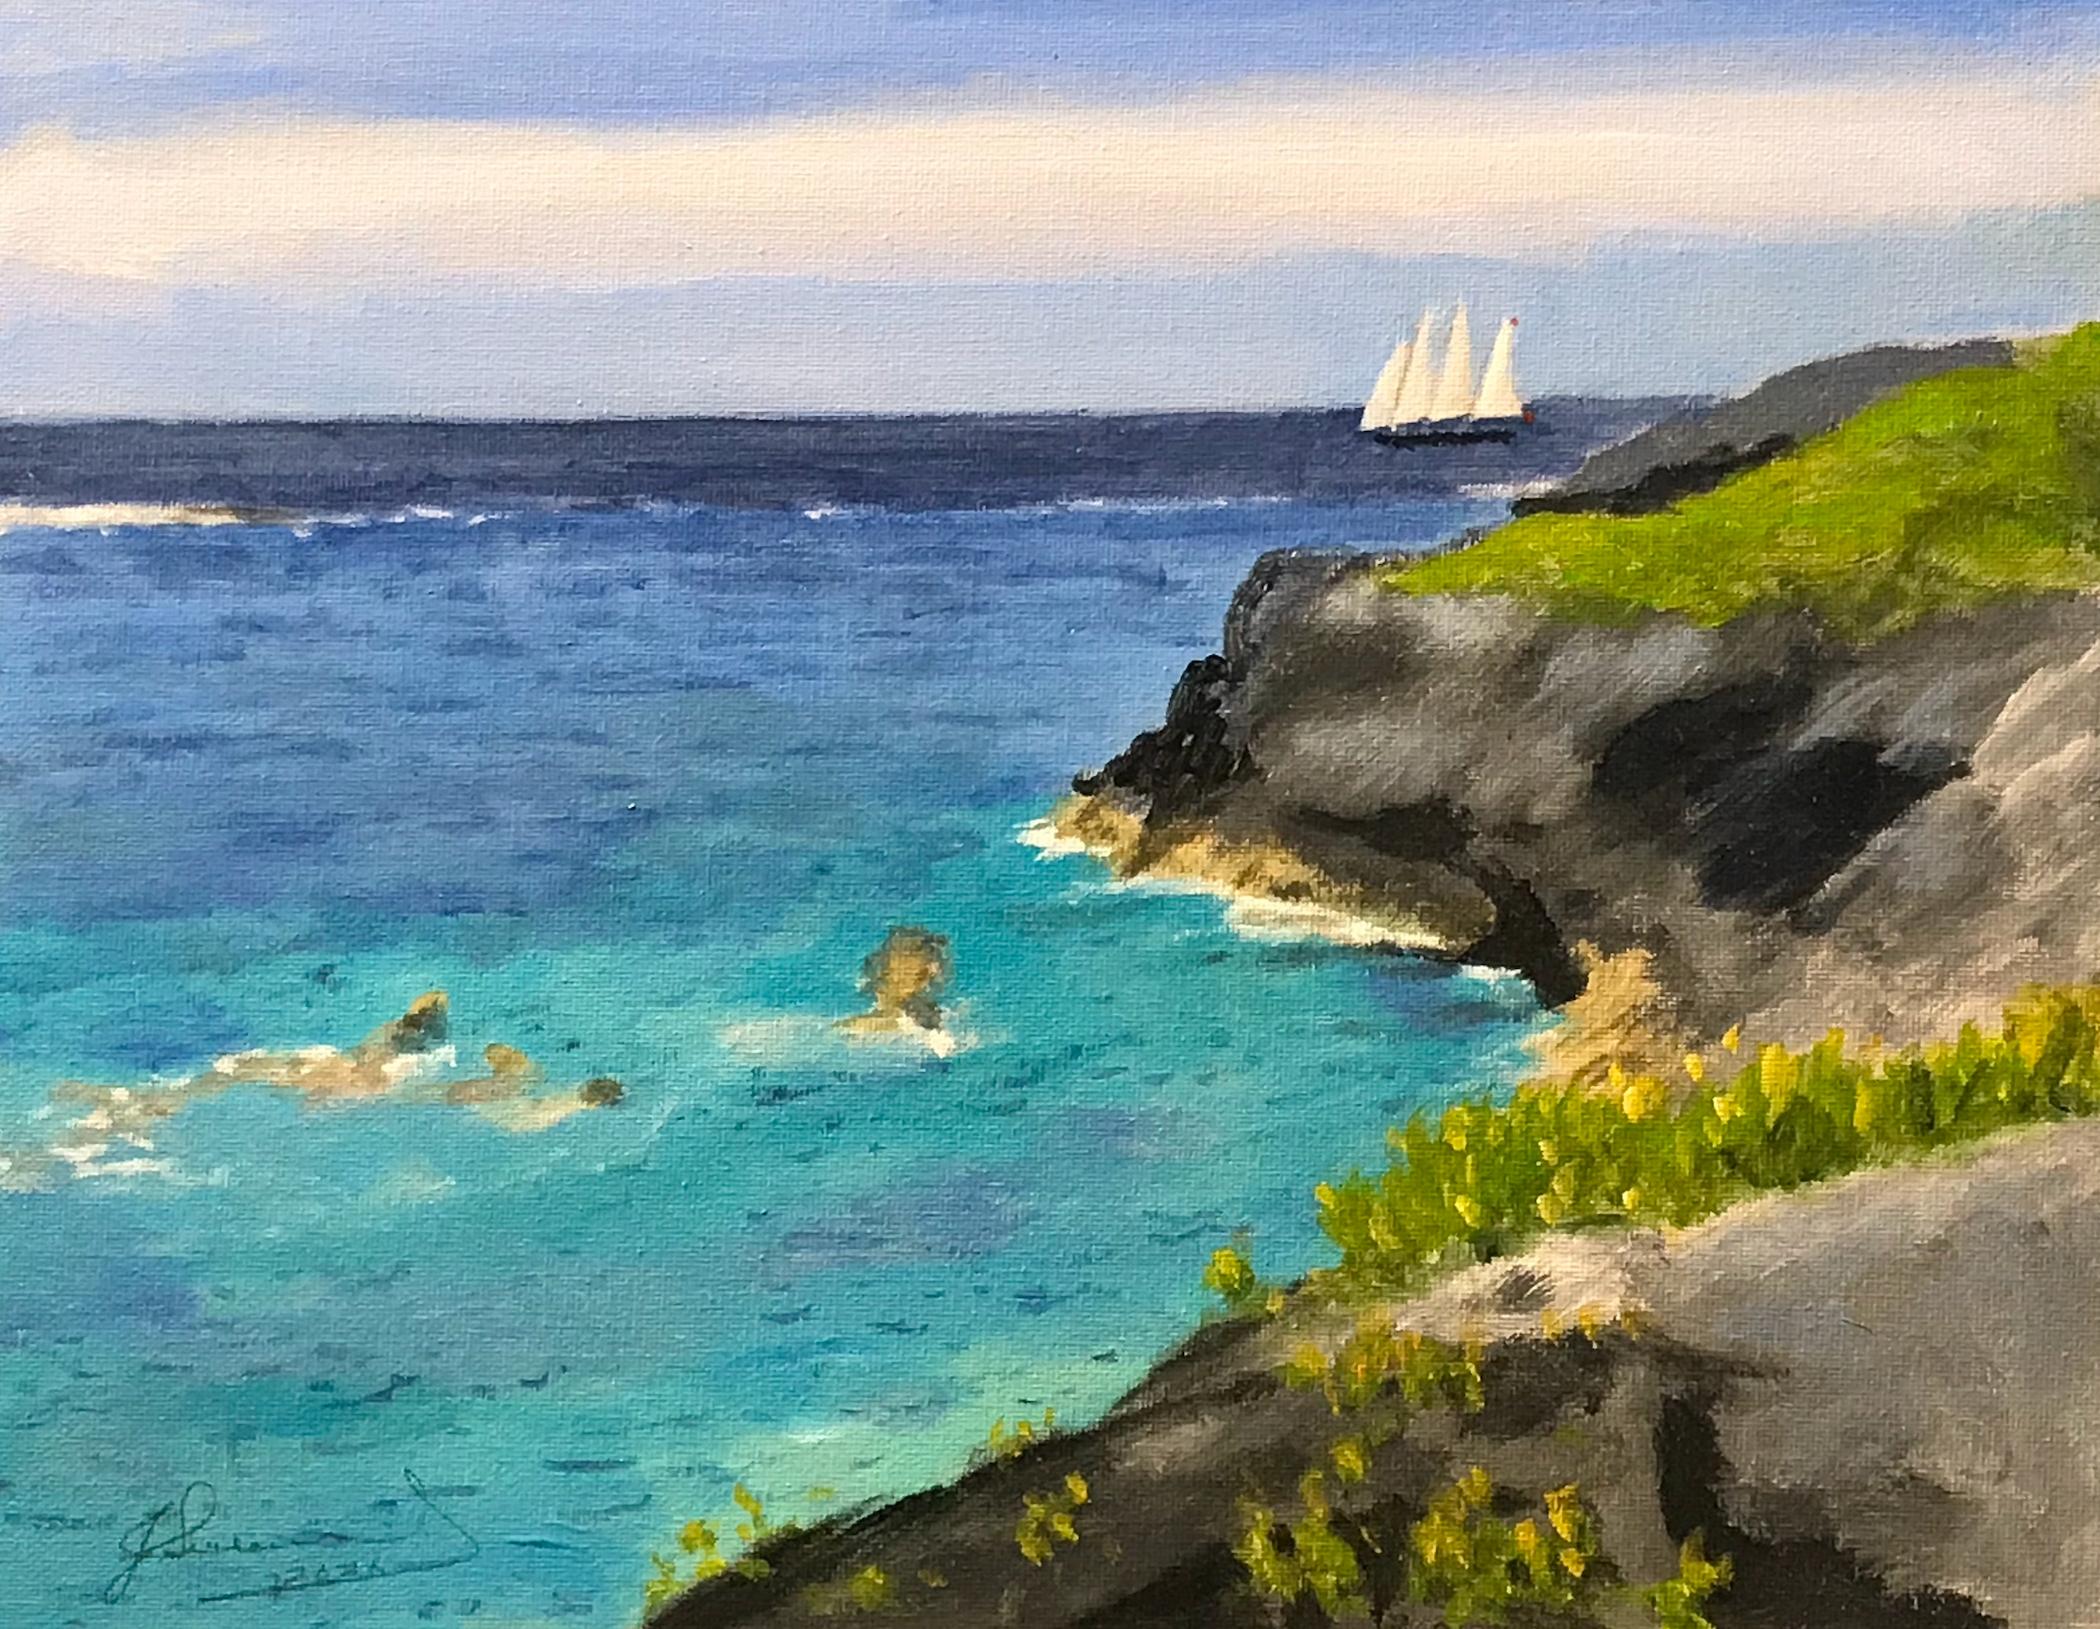 Schooner on the coast copy mqxxfi